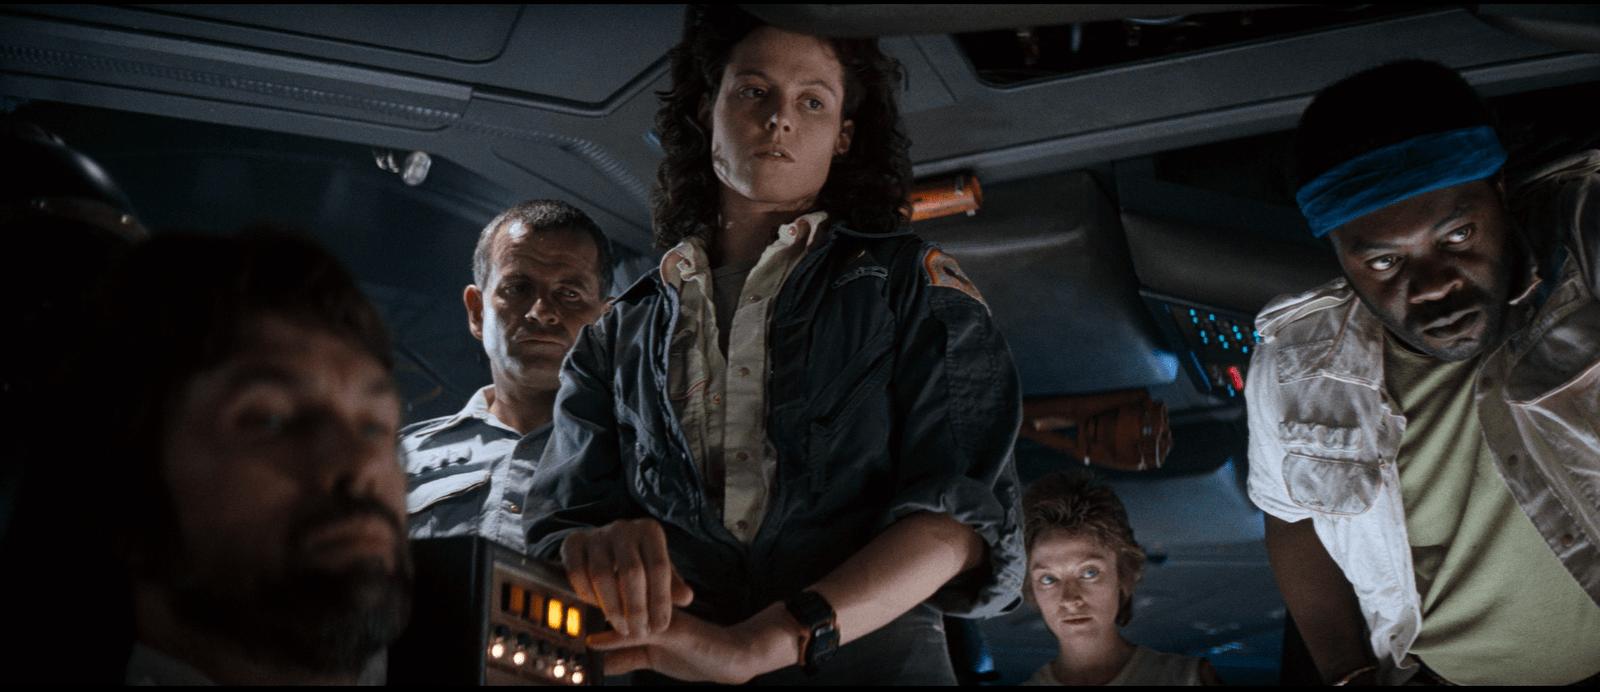 Andrew Migliore's Top 25 Horror Movies